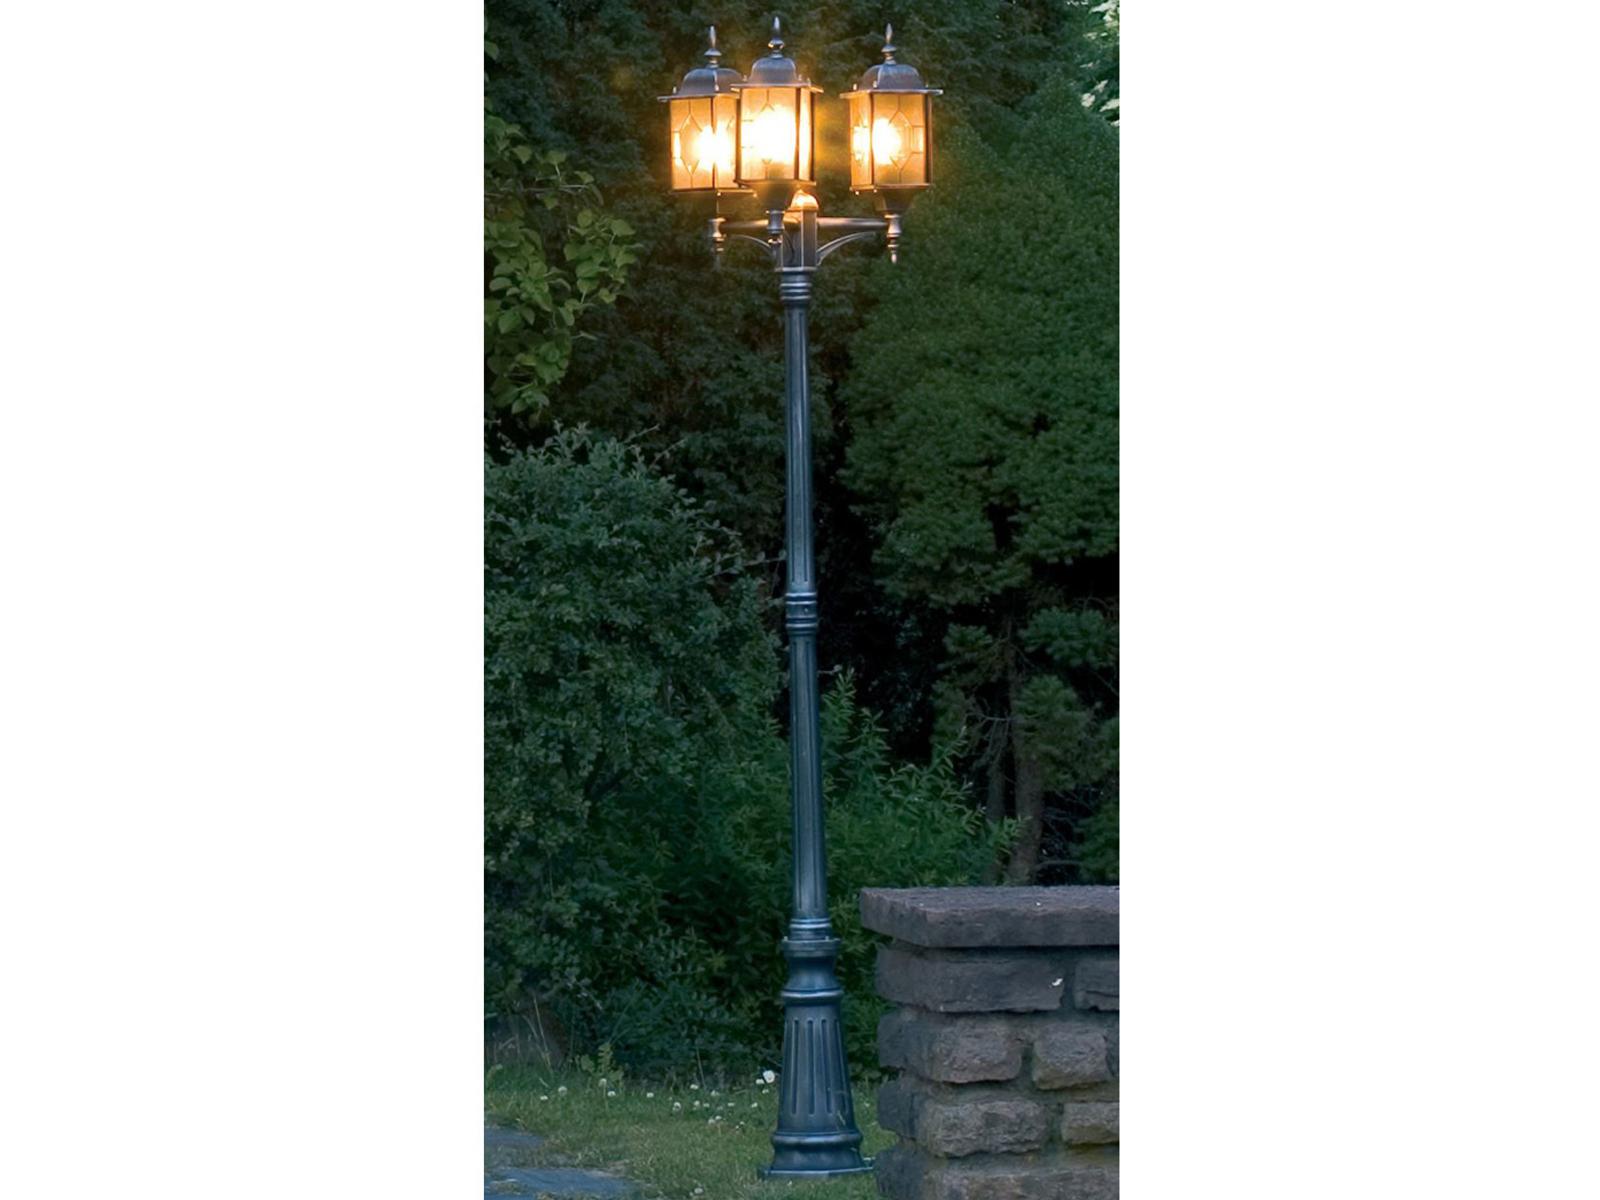 Konstsmide Strade Lanterna candelabro Milano Nero argentoo BLEIKRISTALL Lampada